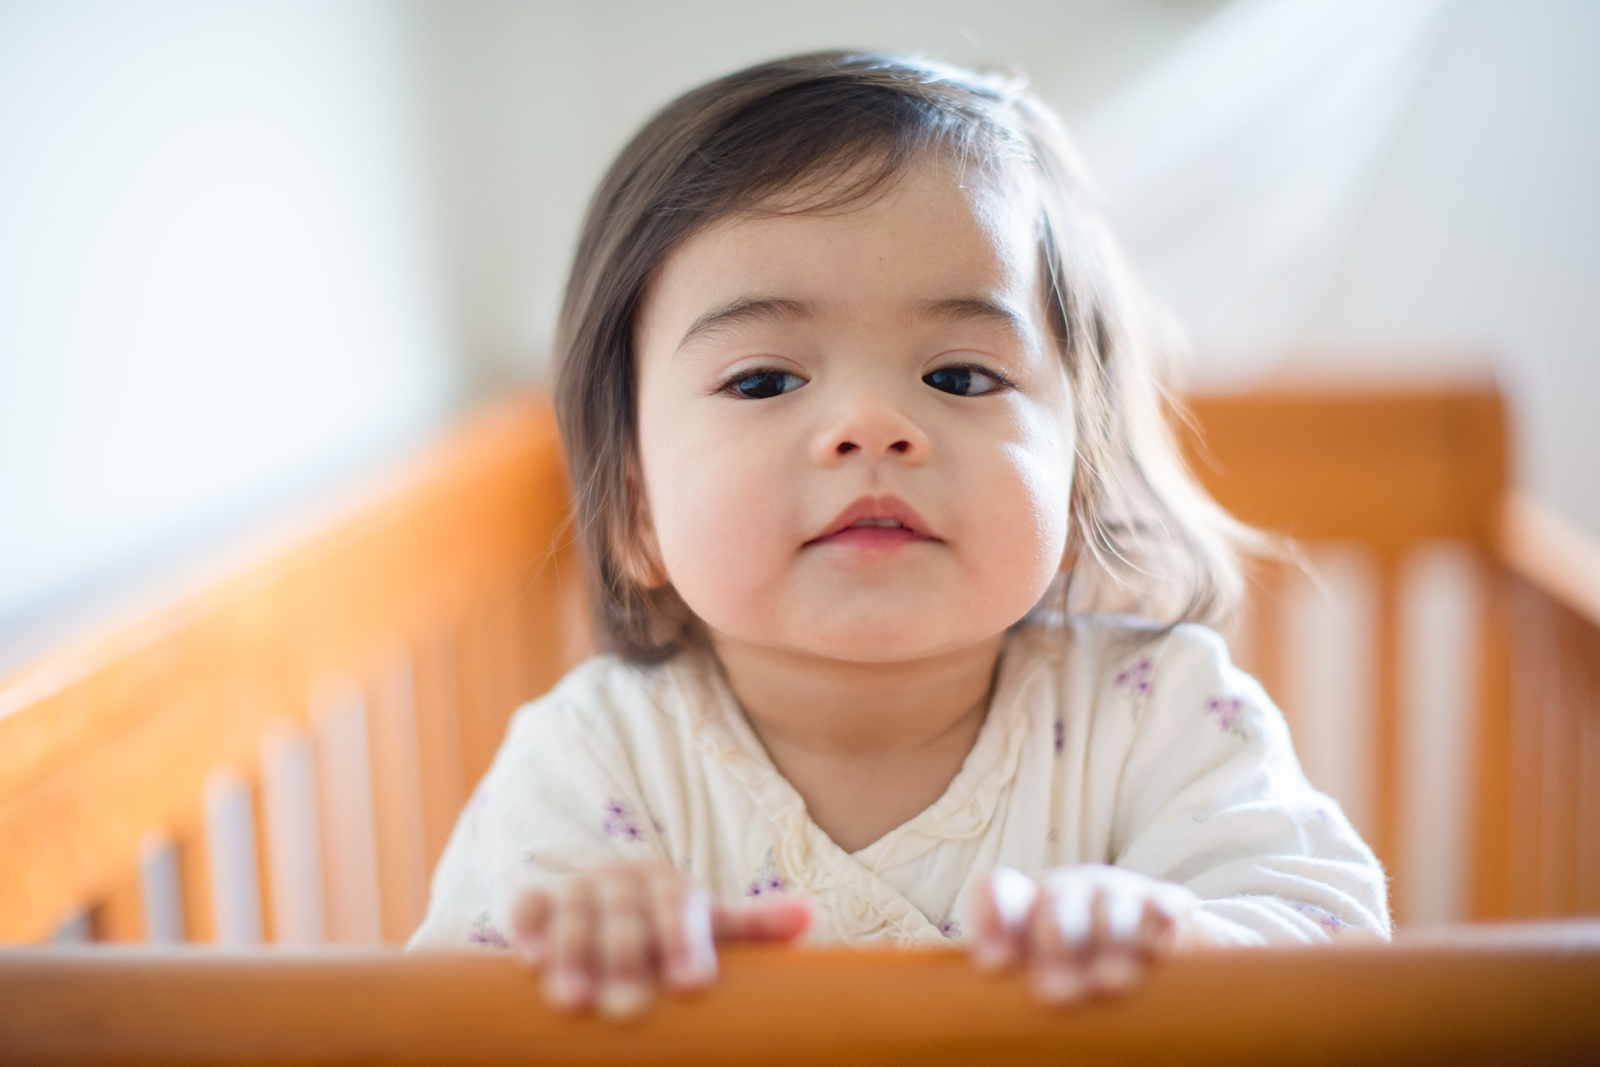 20130814-Amelia Stands in Crib-BLOGGrid_0013.jpg